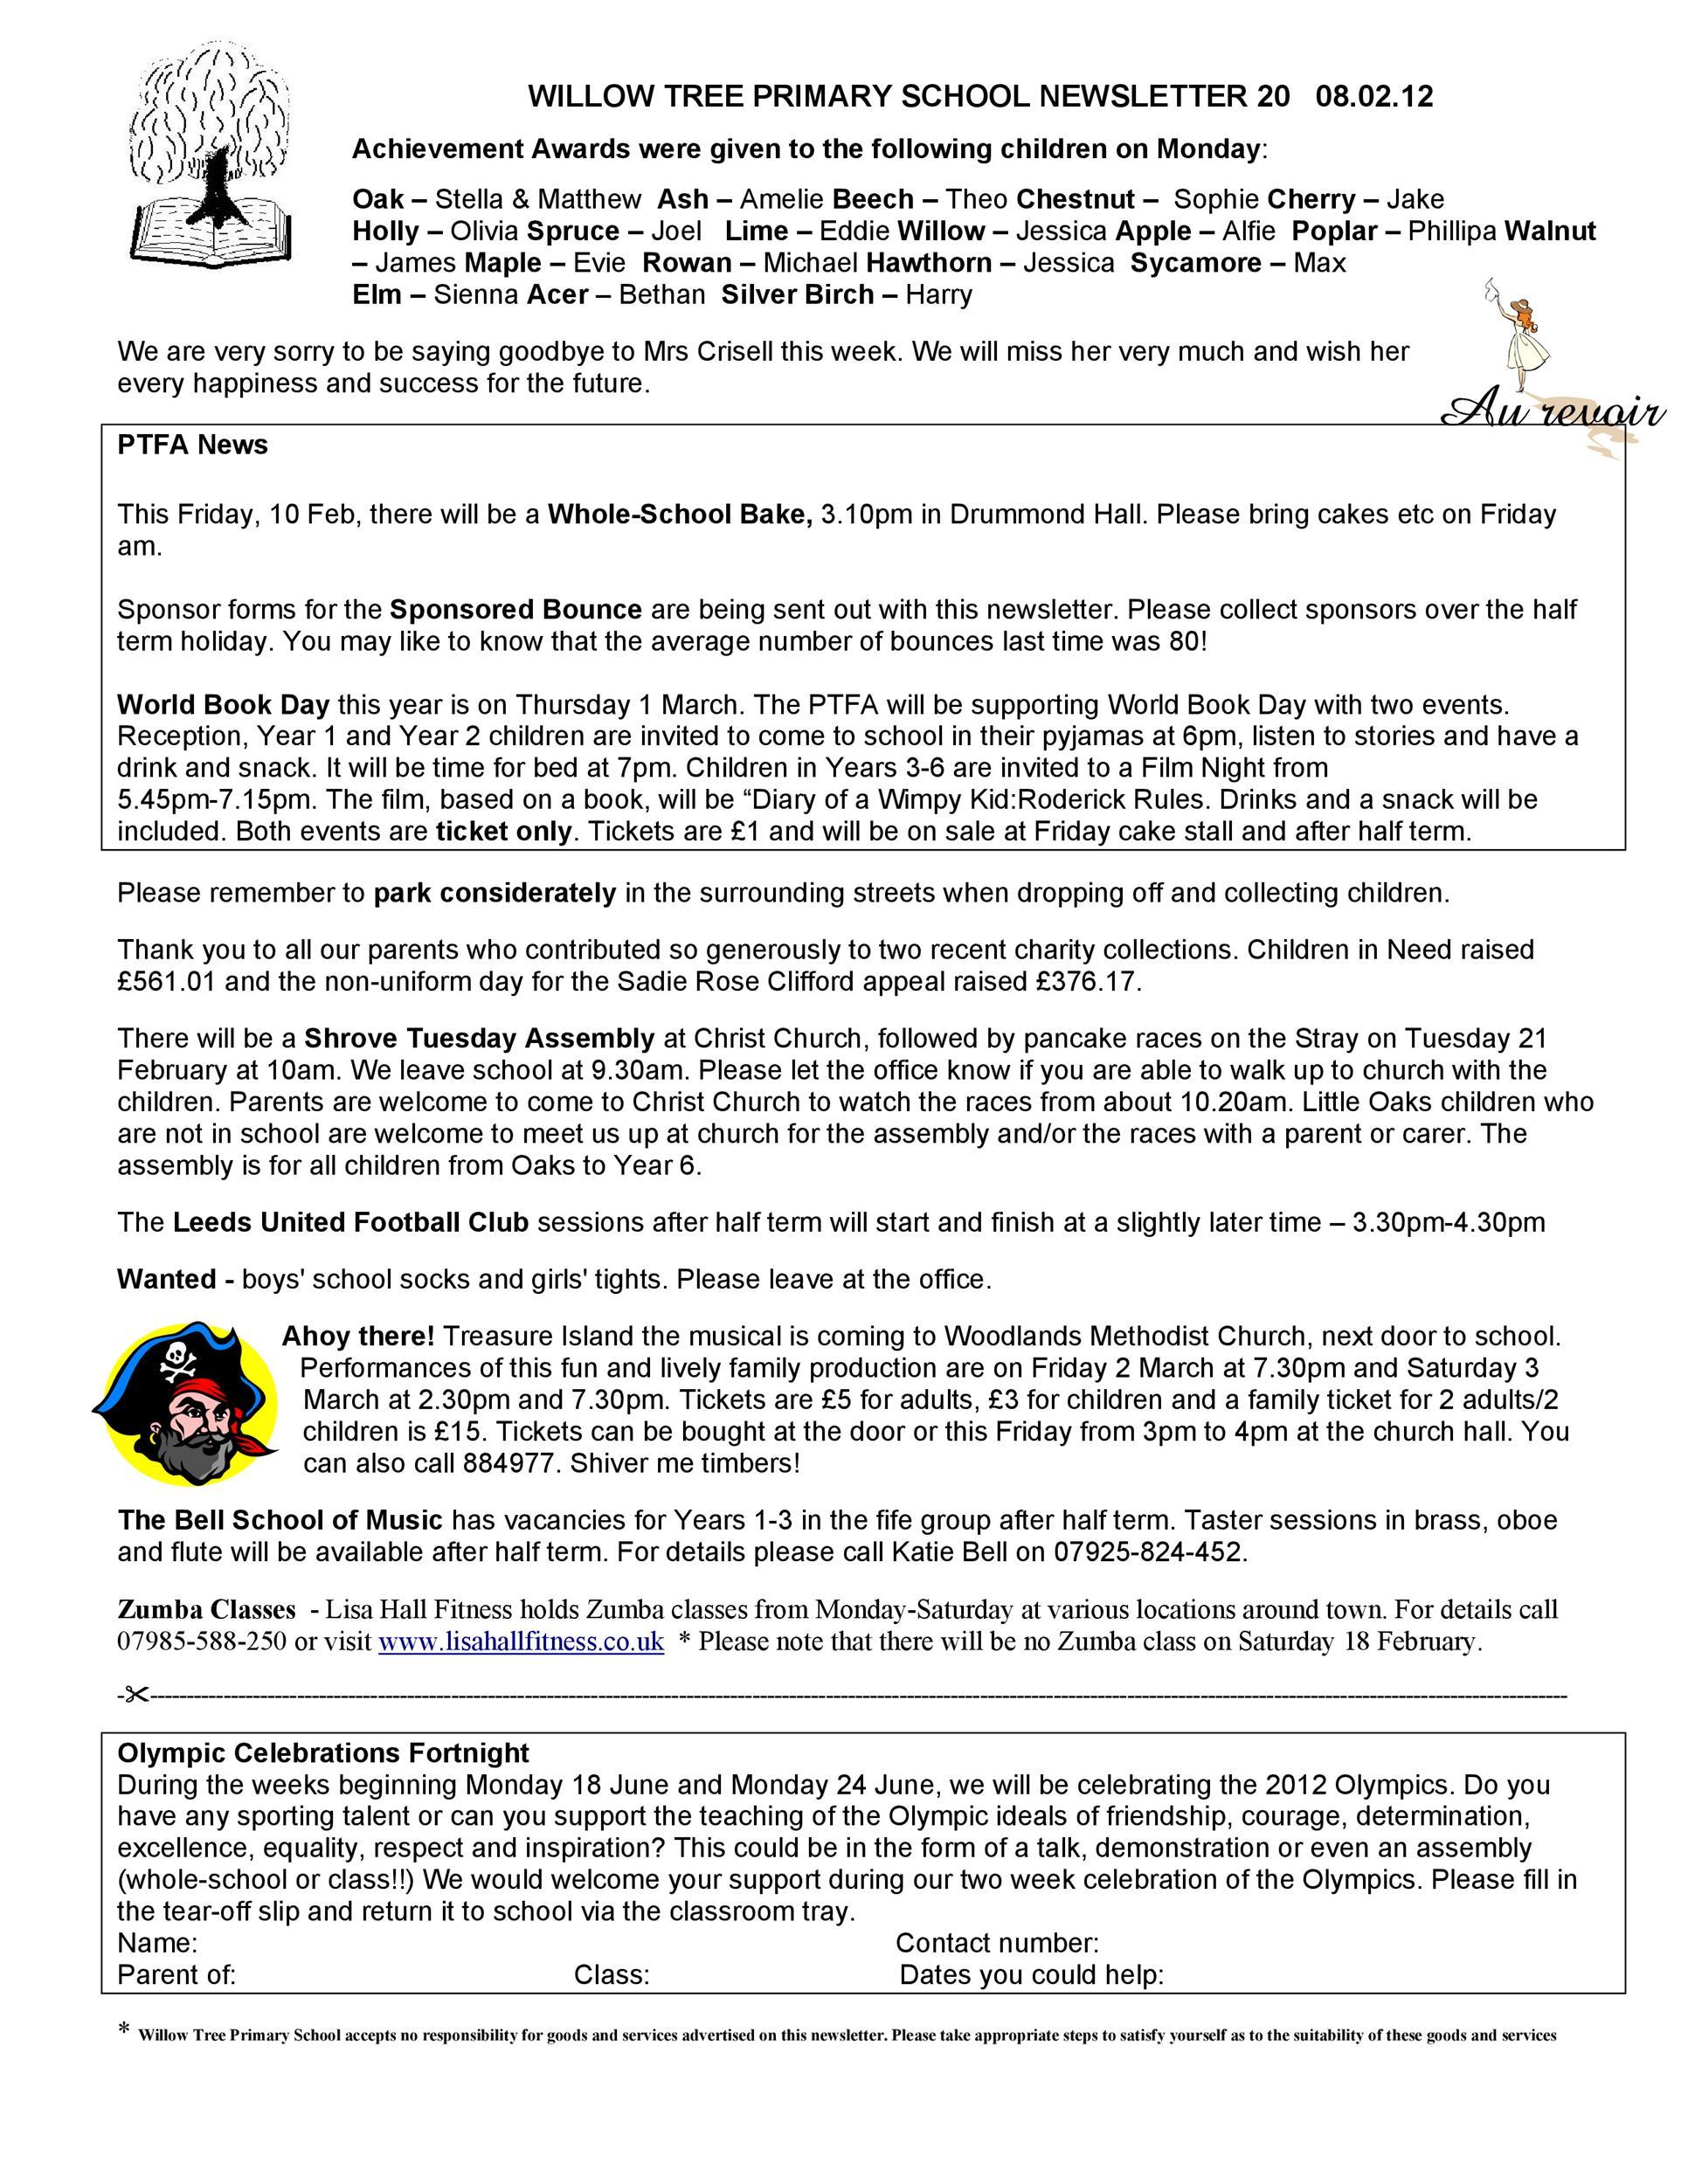 Free preschool newsletter template 49